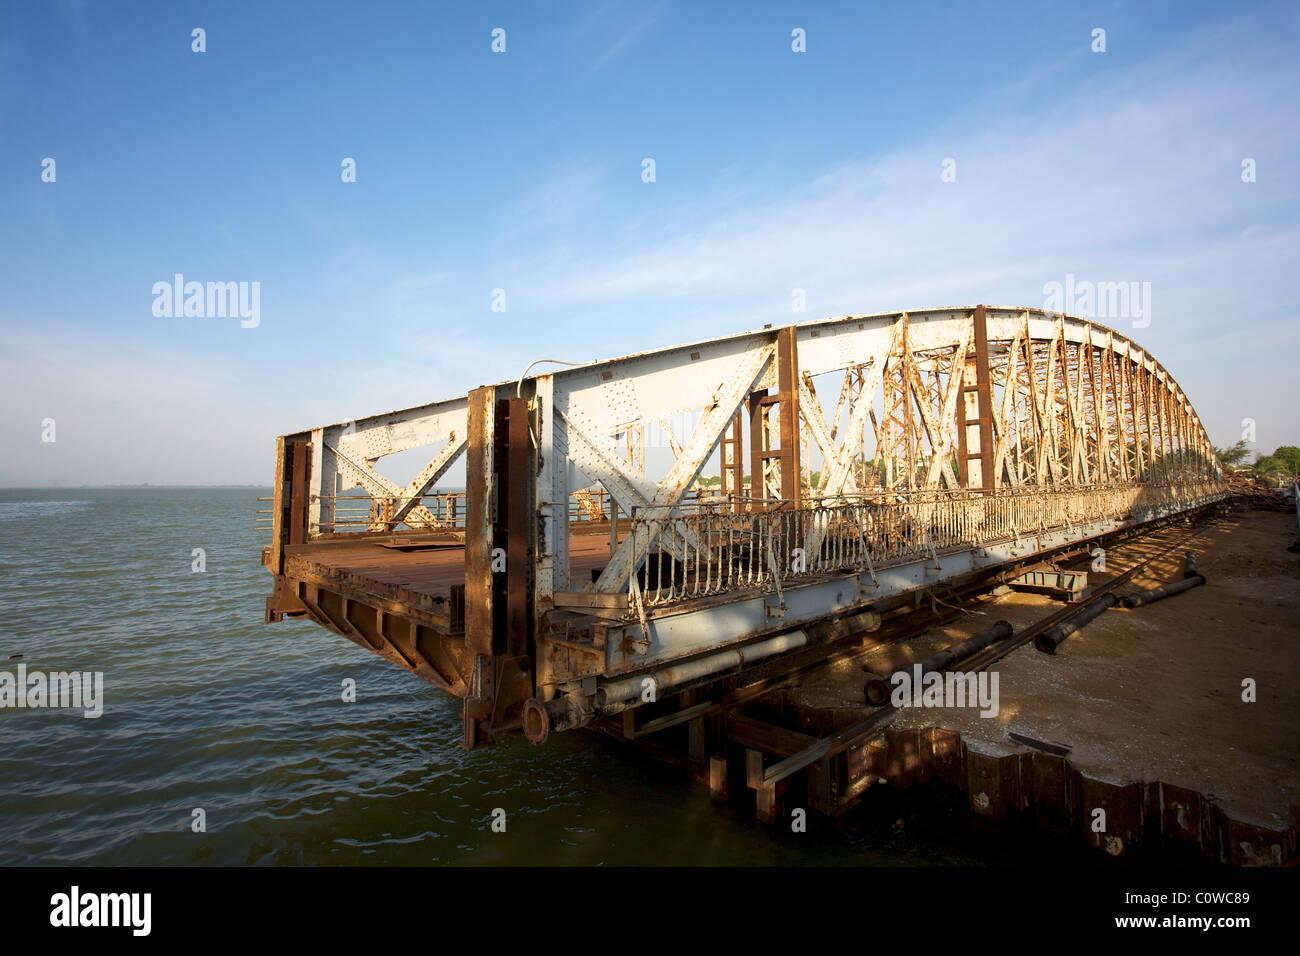 Pont Faidherbe bridge Welcome in Saint-Louis, Senegal - Stock Image